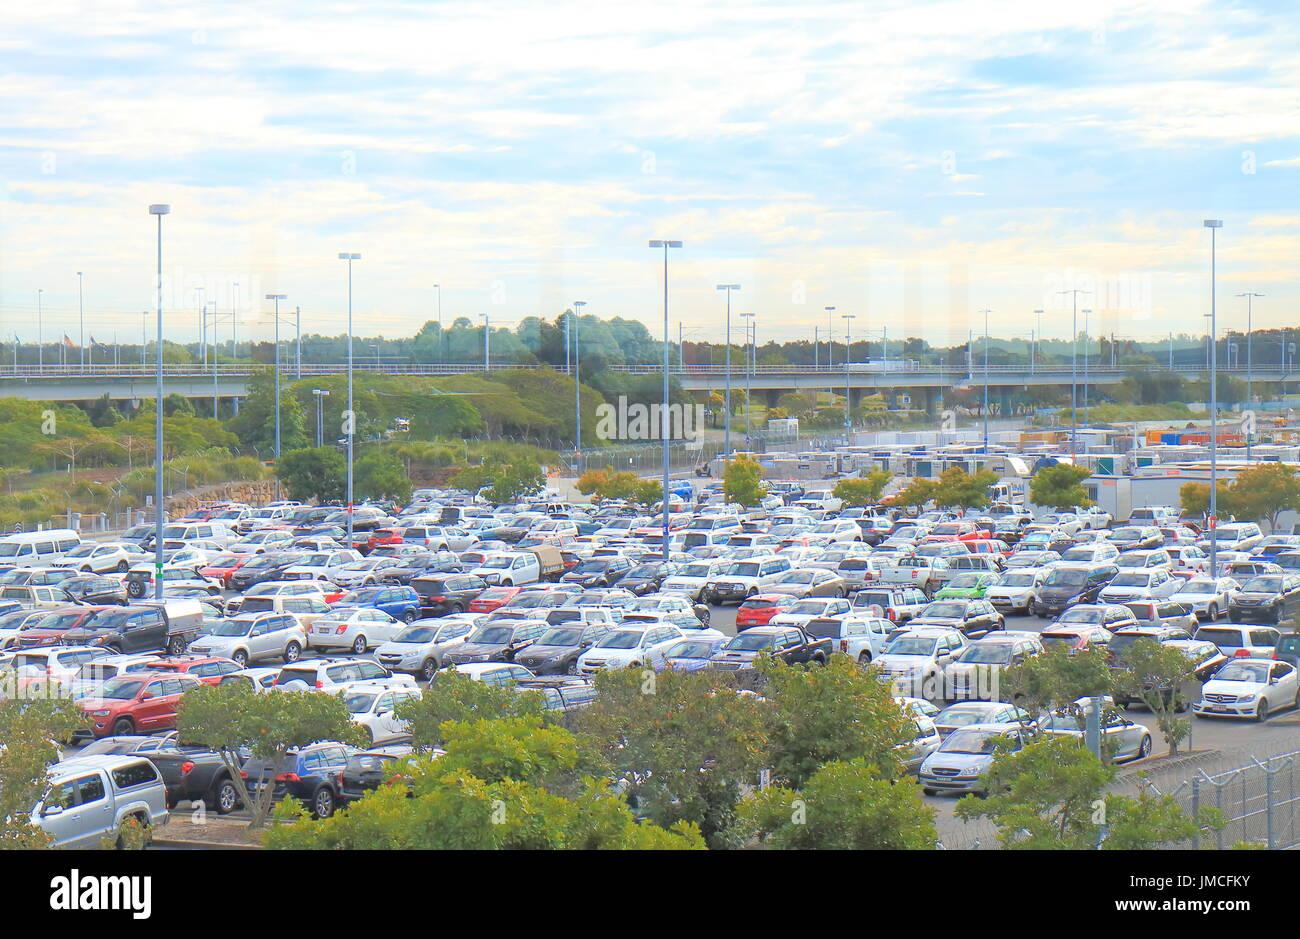 Brisbane airport parking coupons